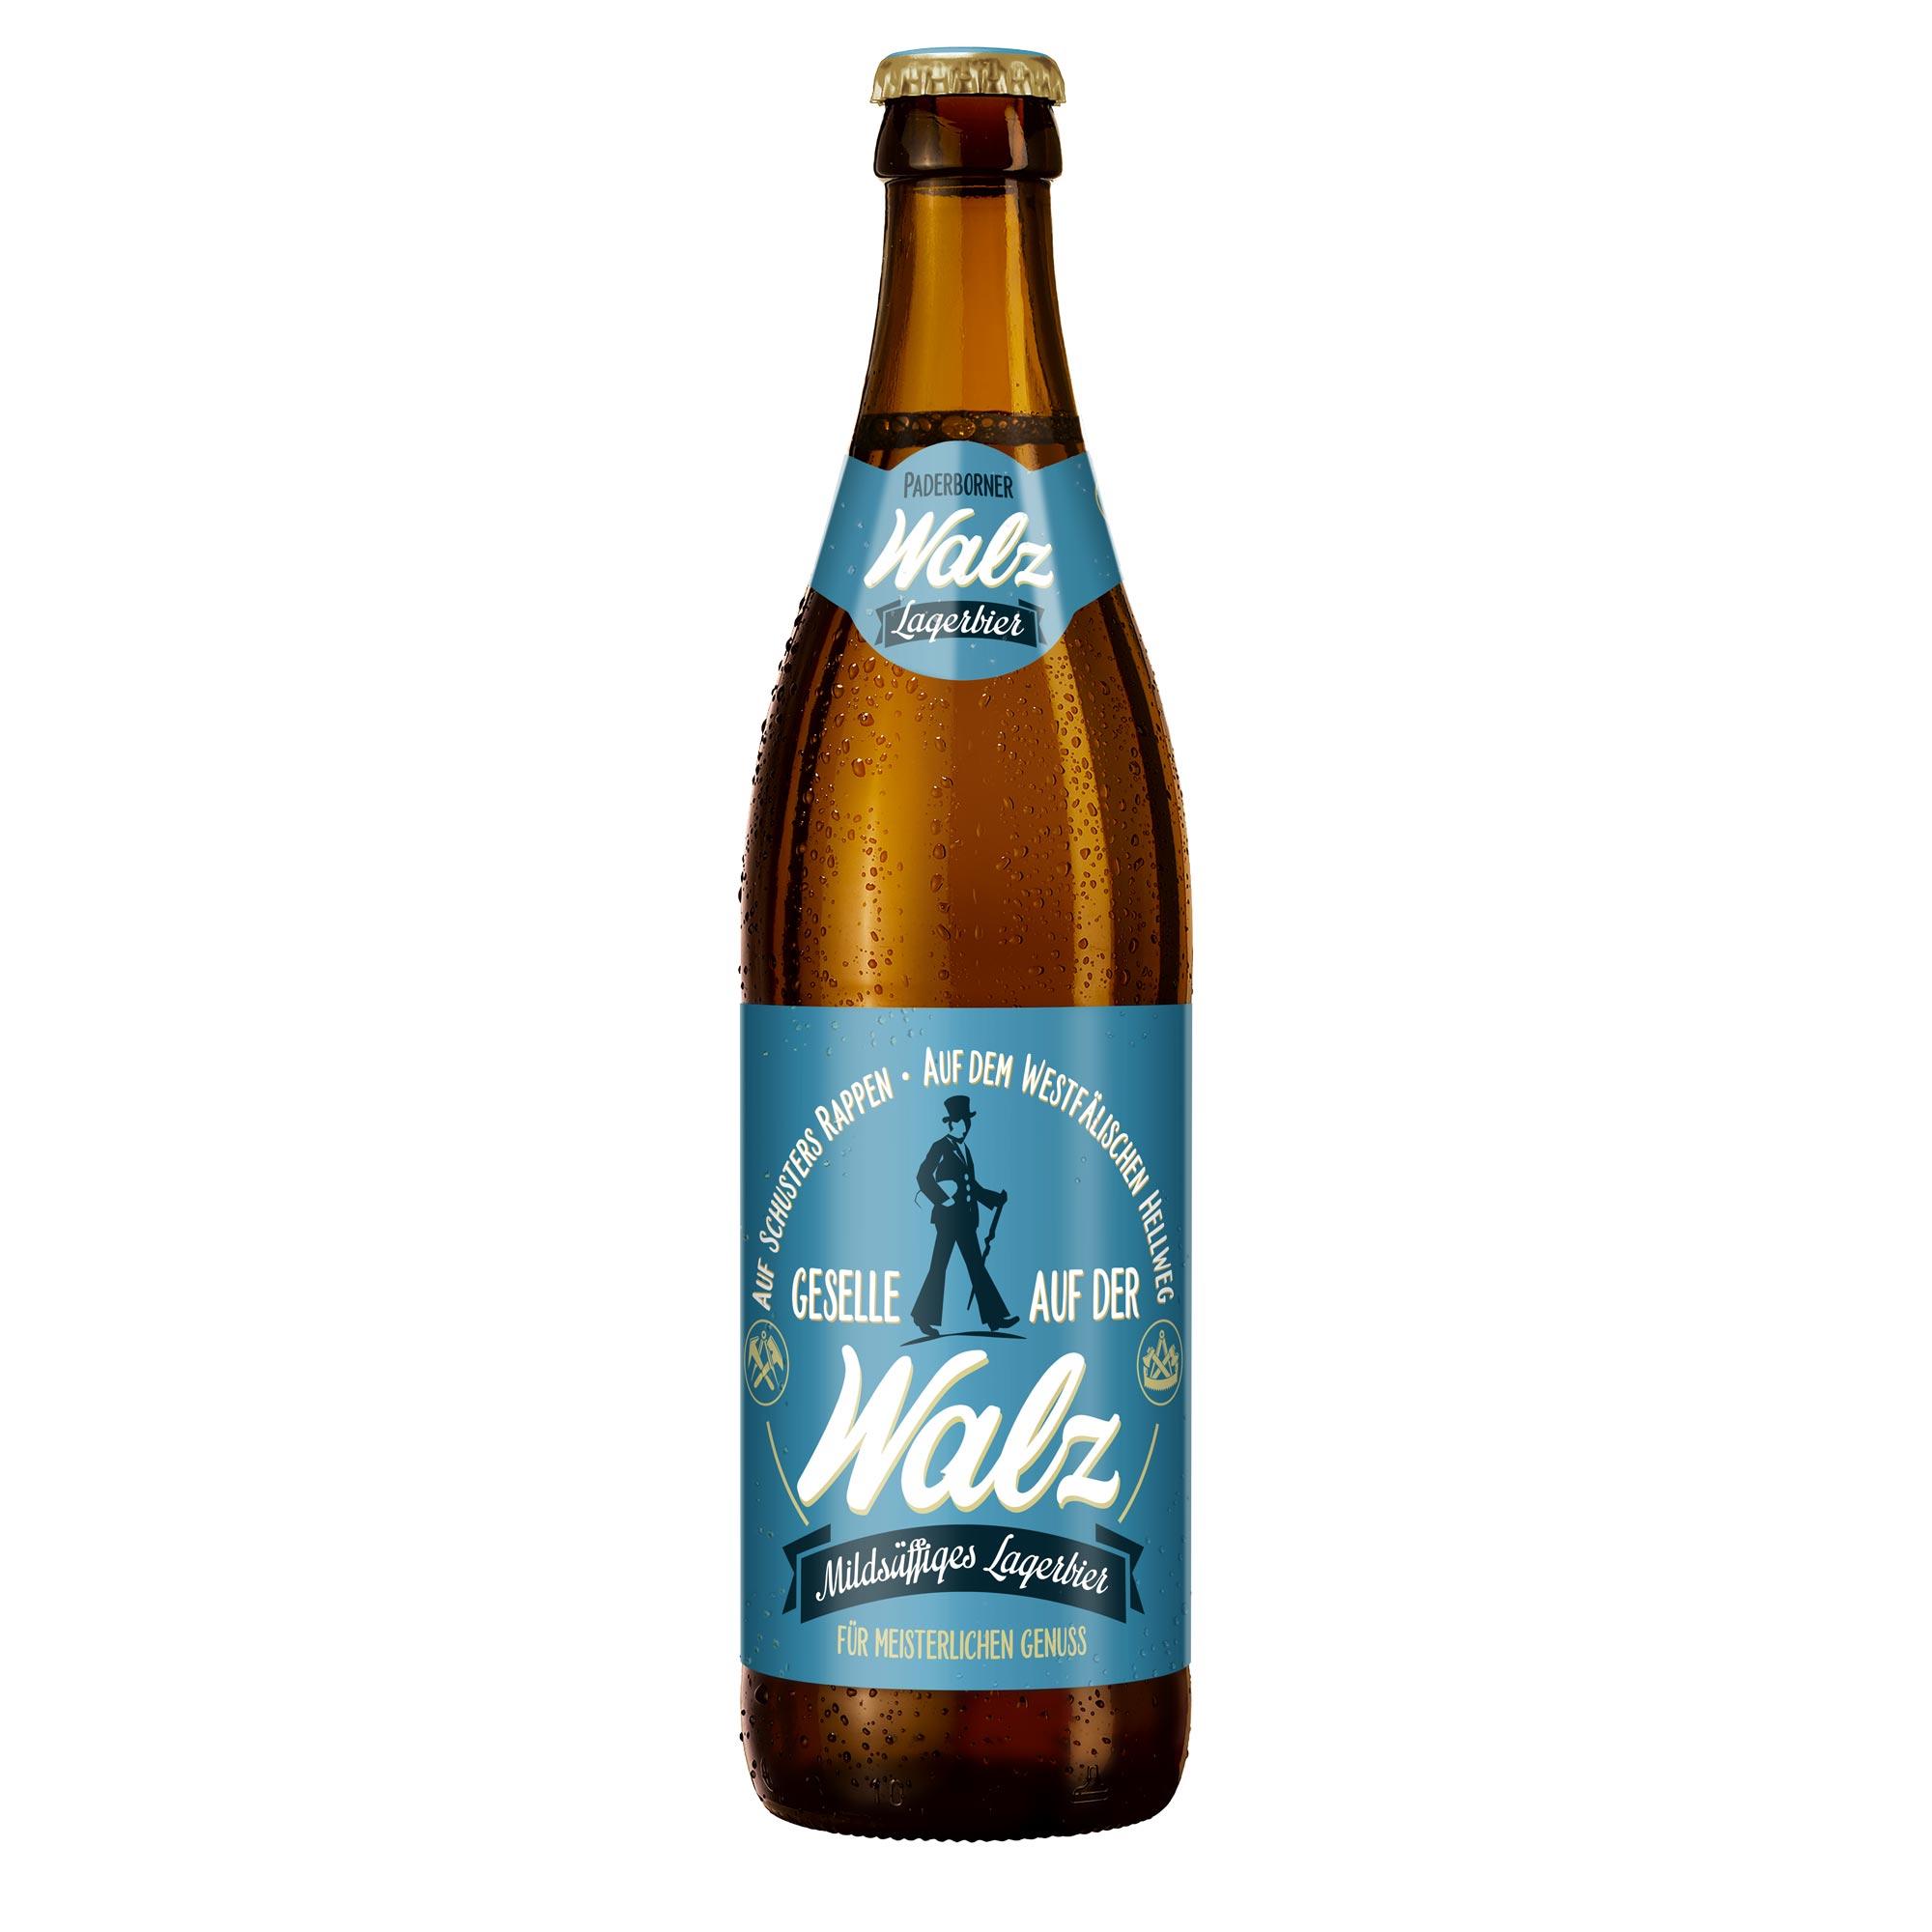 Produktabbildung Paderborner Walz Flasche 0,5 l